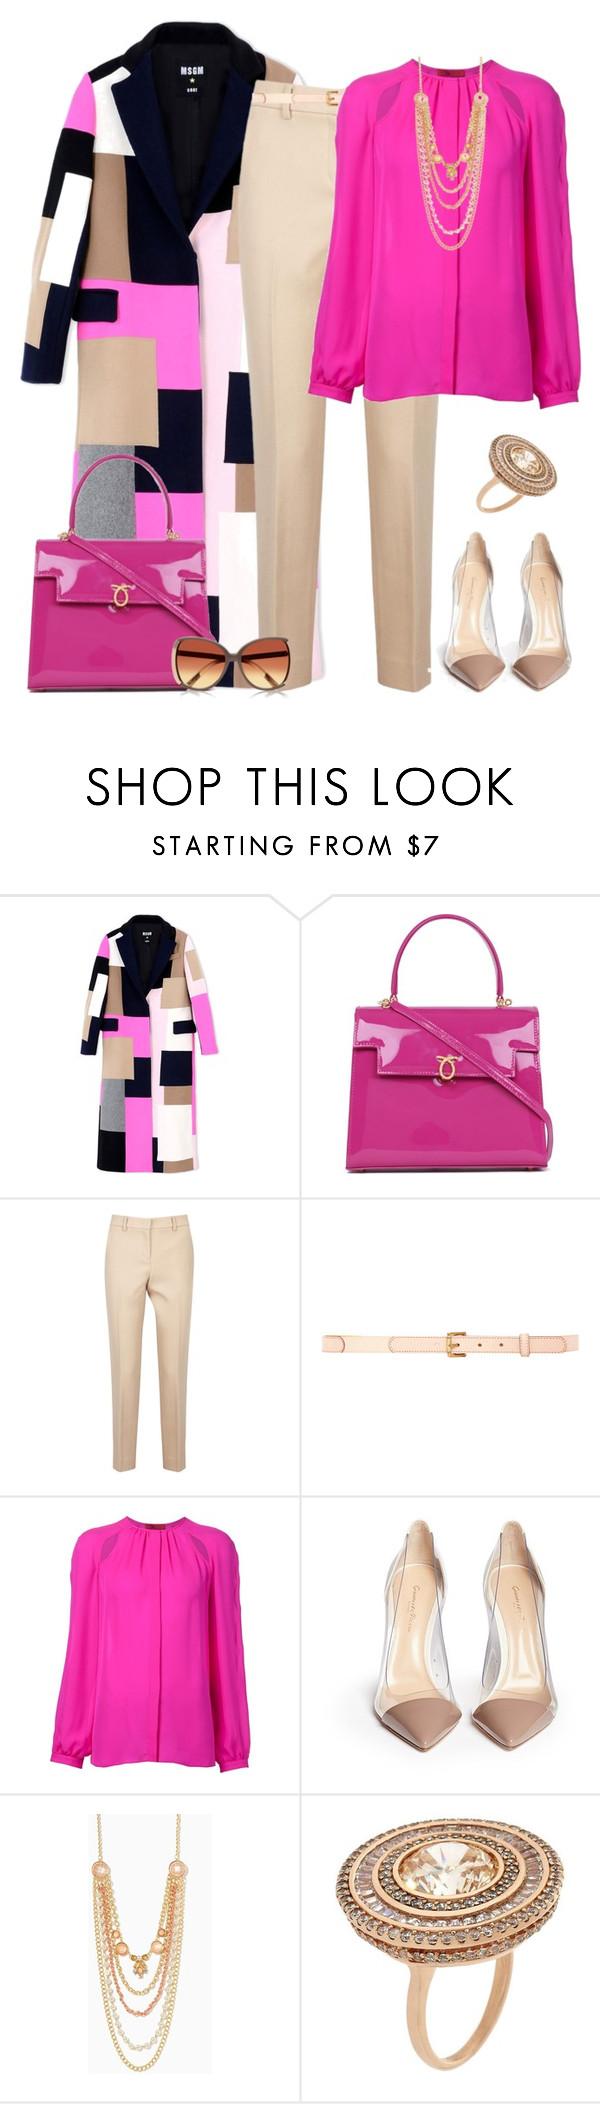 """outfit 2592"" by natalyag ❤ liked on Polyvore featuring MSGM, Launer, DKNY, Nina Ricci, Tamara Mellon, Gianvito Rossi, CARAT* and River Island"